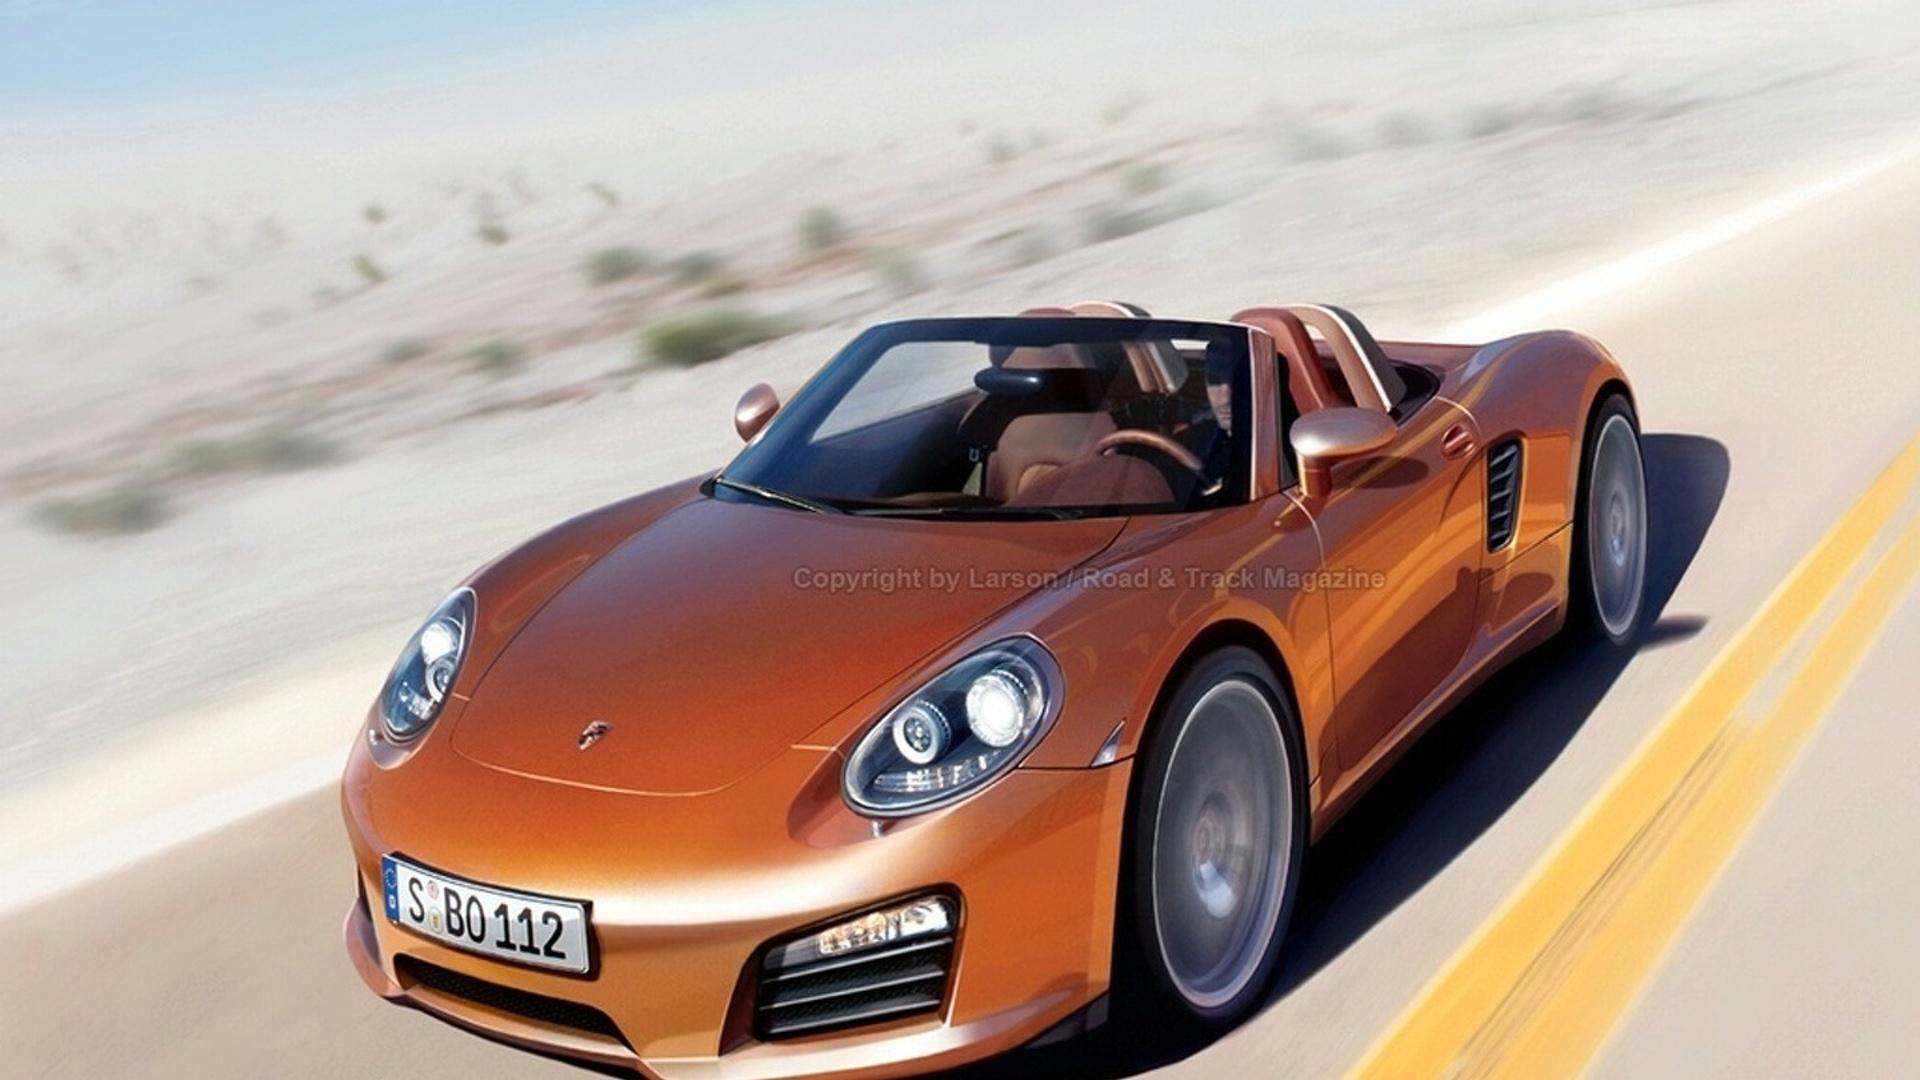 Porsche to revive 356 Speedster in 2013?